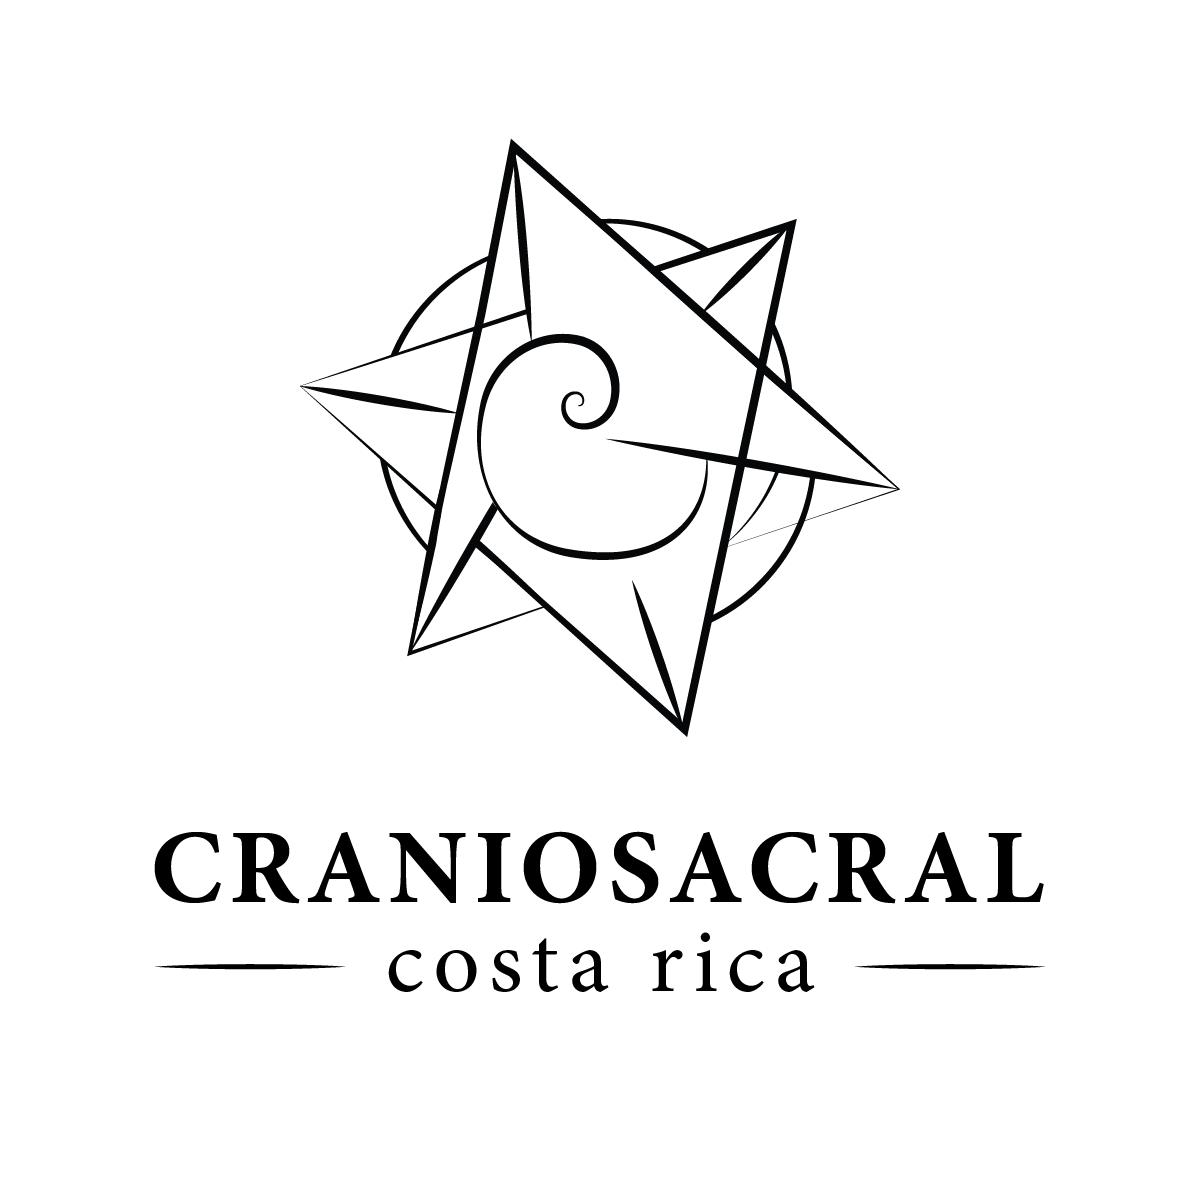 Craniosacral Costa Rica Logo Design